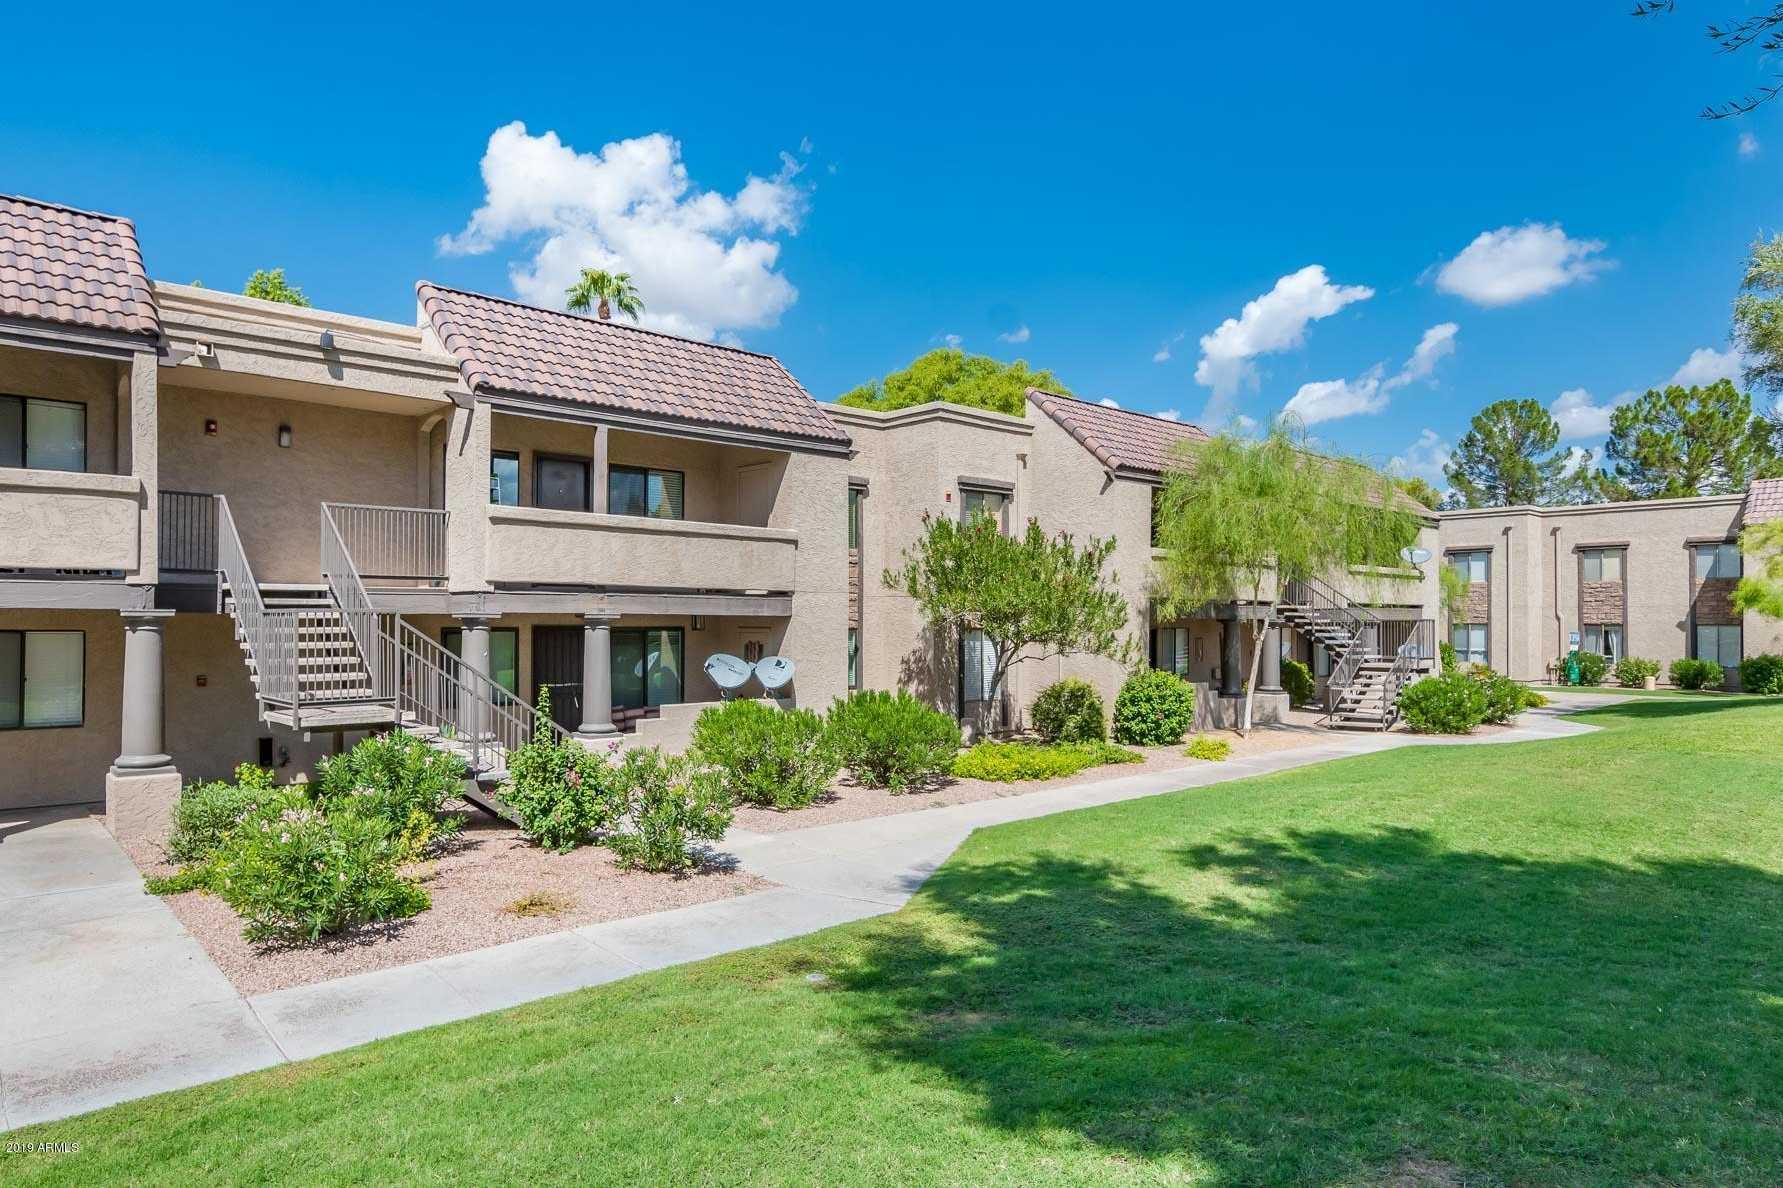 $214,000 - 2Br/2Ba -  for Sale in Las Colinas, Scottsdale